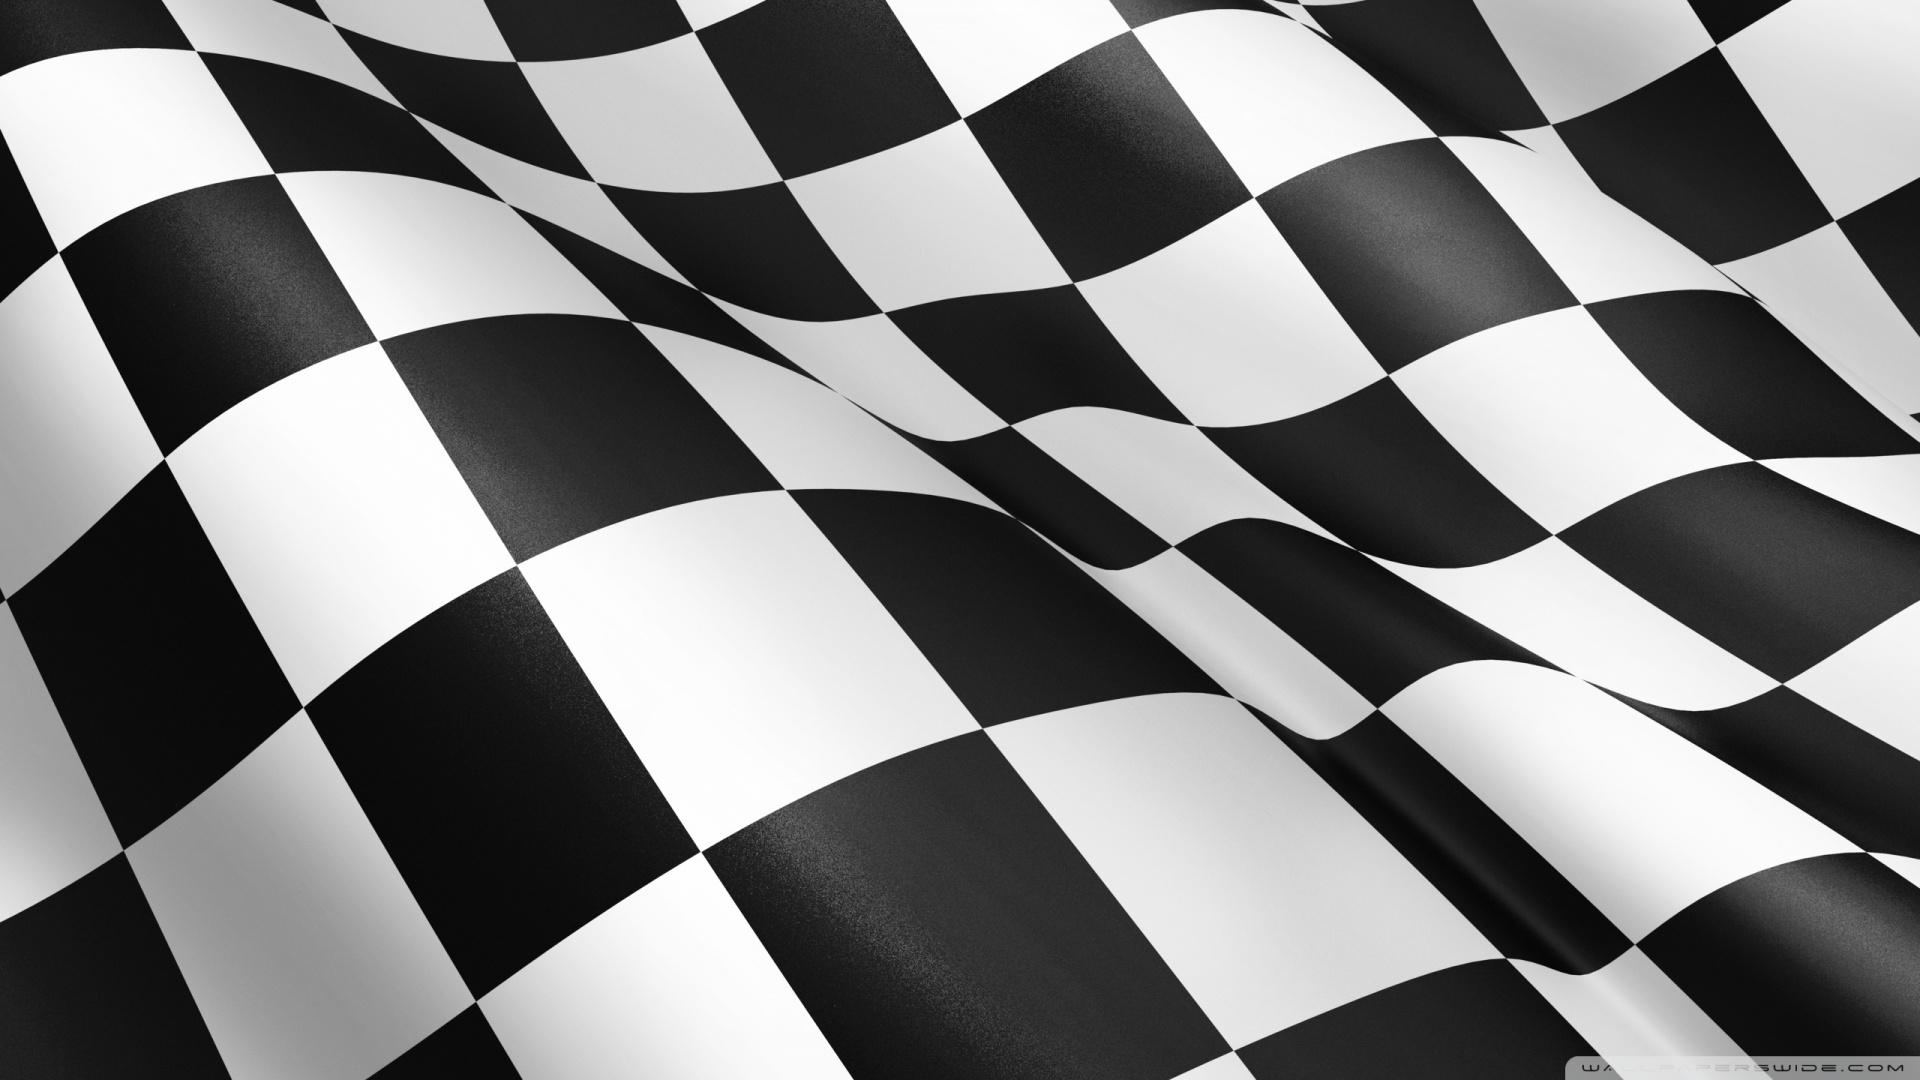 Racing Flag 4K HD Desktop Wallpaper for 4K Ultra HD TV Dual 1920x1080